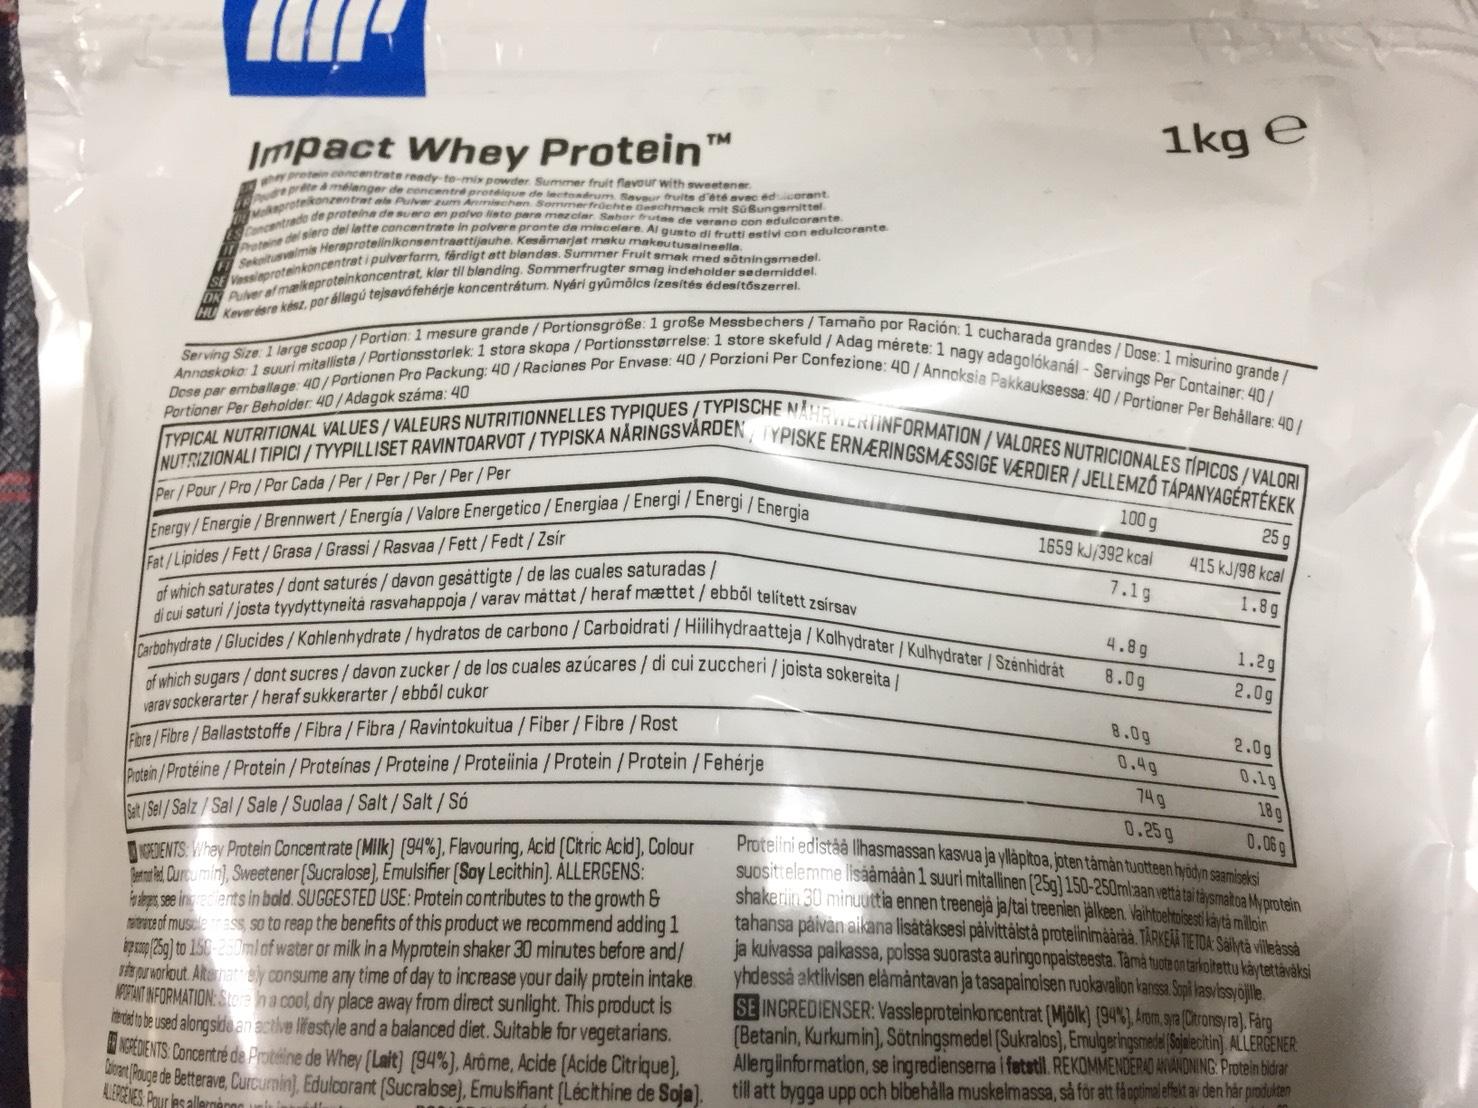 【WPC】Impactホエイプロテイン「サマーフルーツ味」の成分表